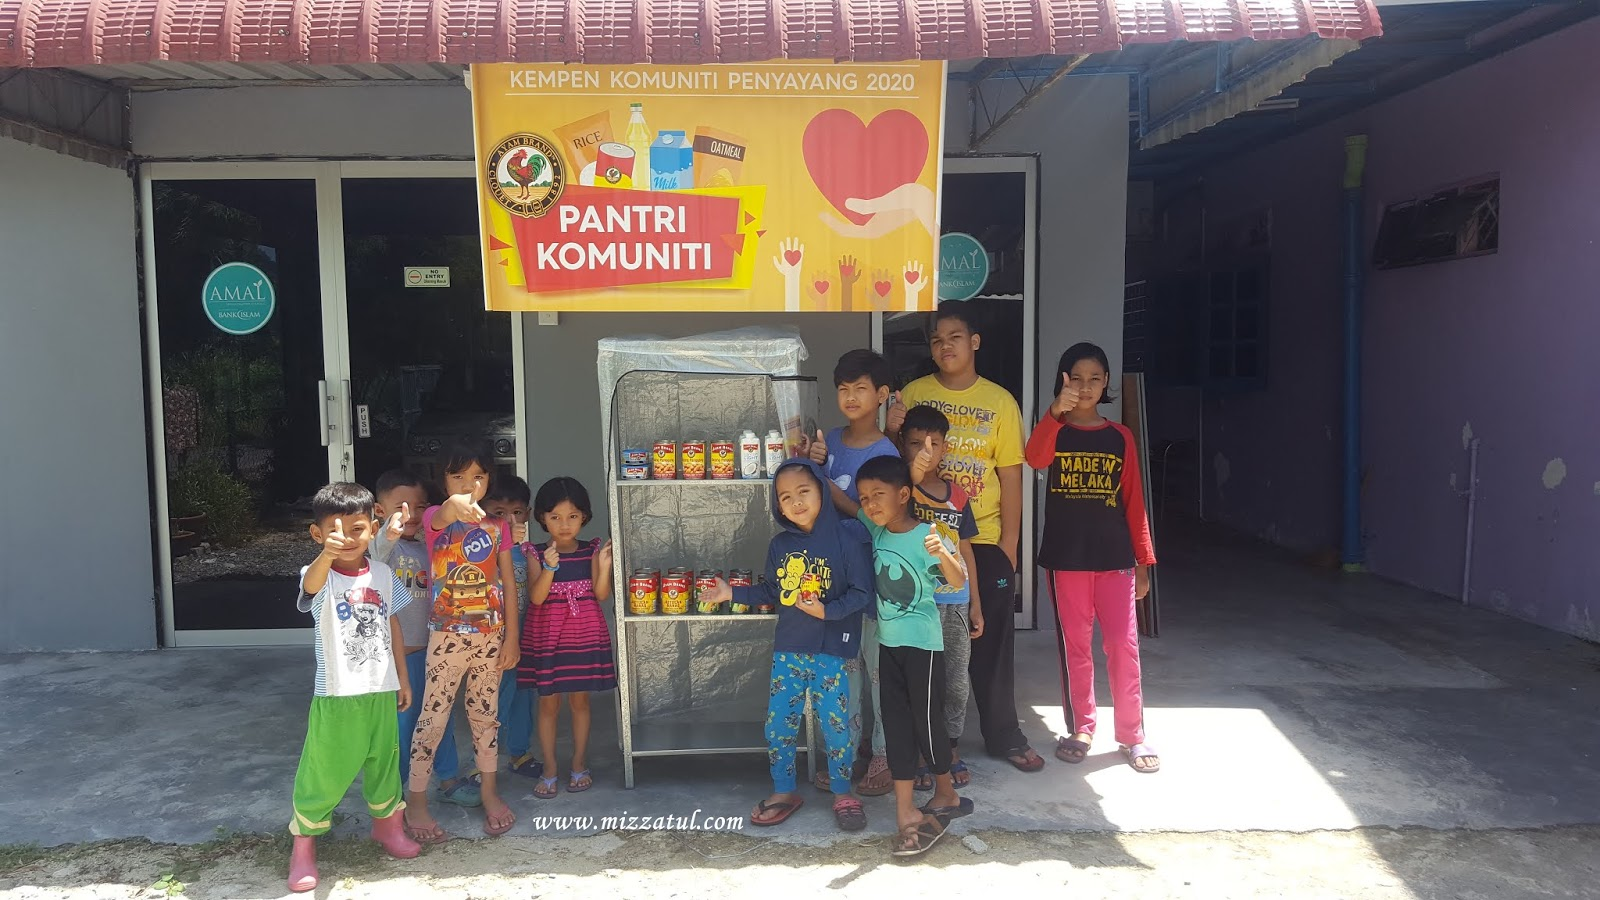 Ayam Brand Campaign